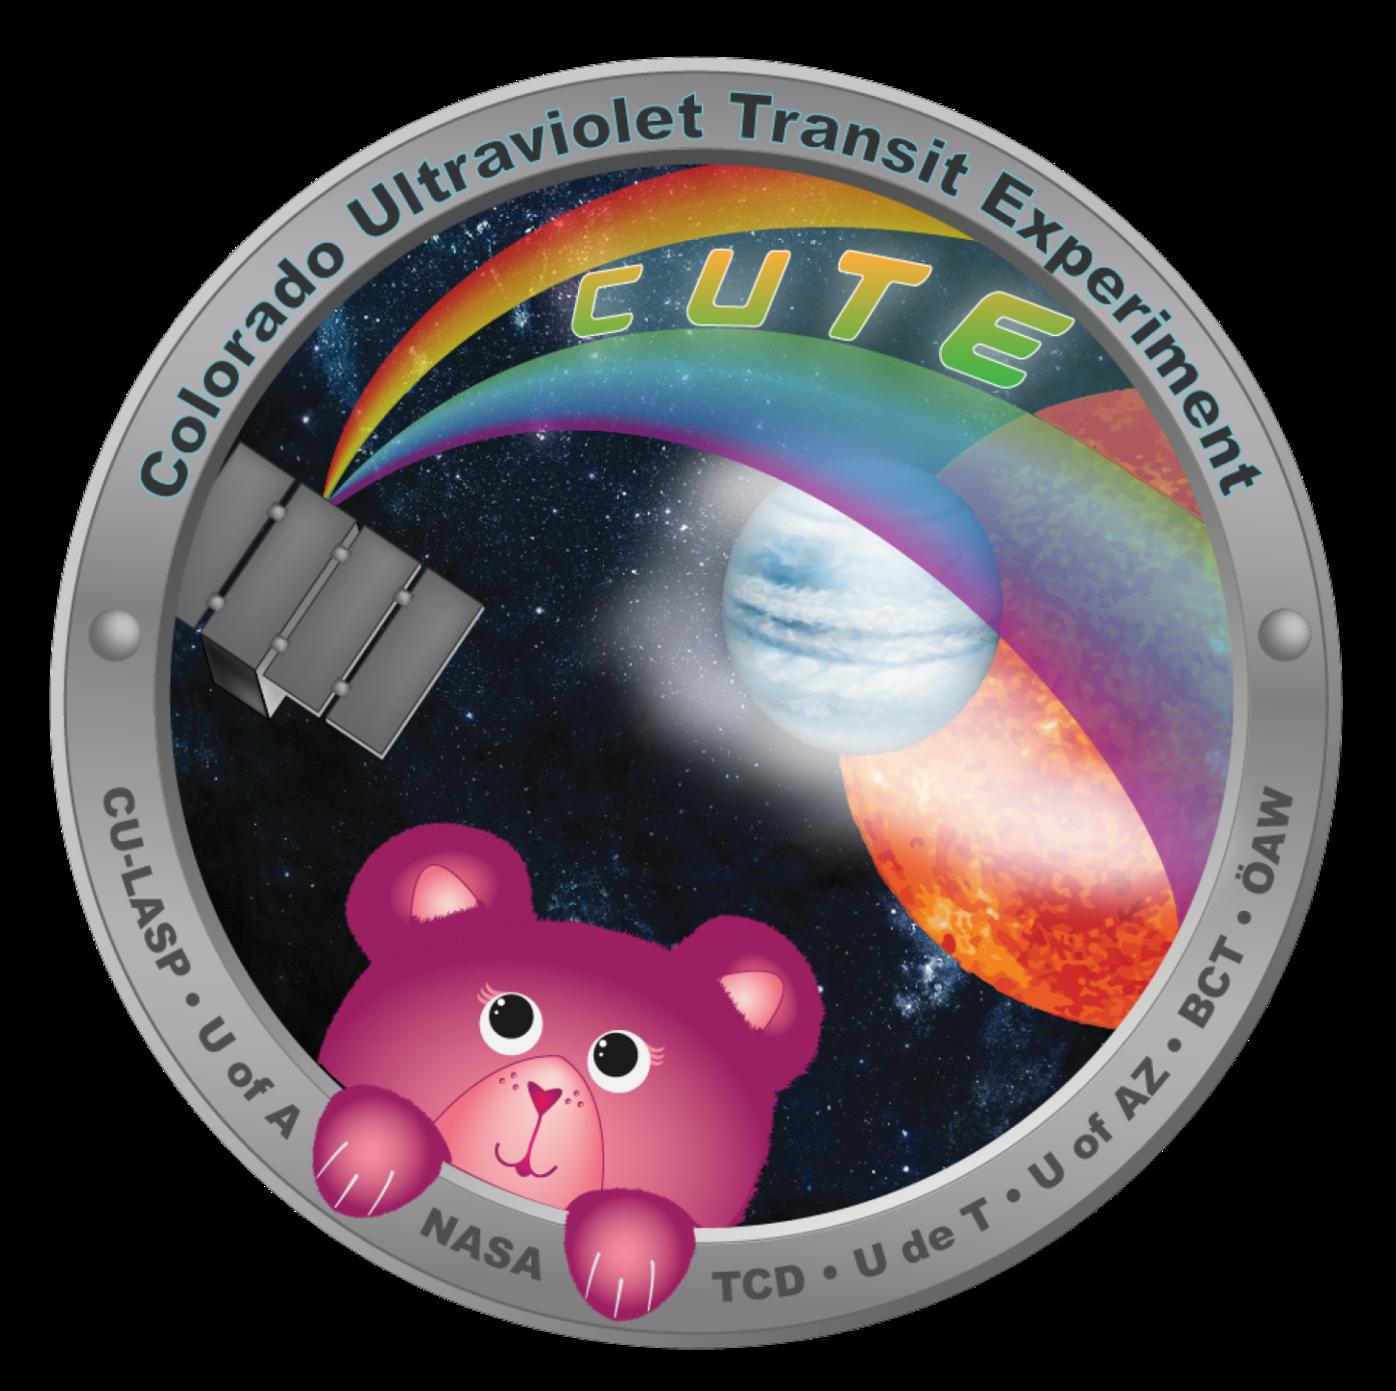 Colorado Ultraviolet Transit Experiment